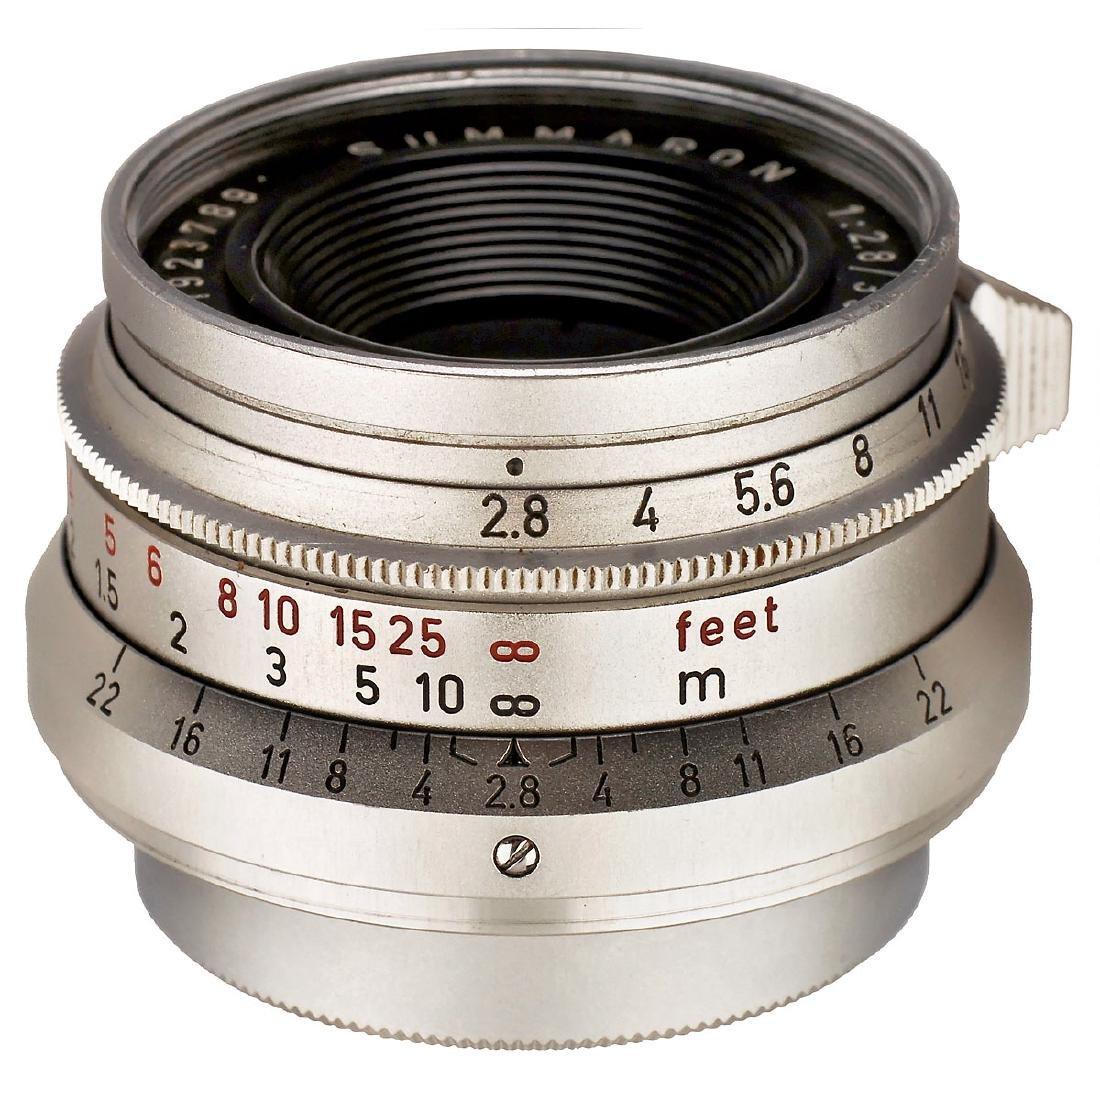 Summaron 2,8/35 mm, 1962